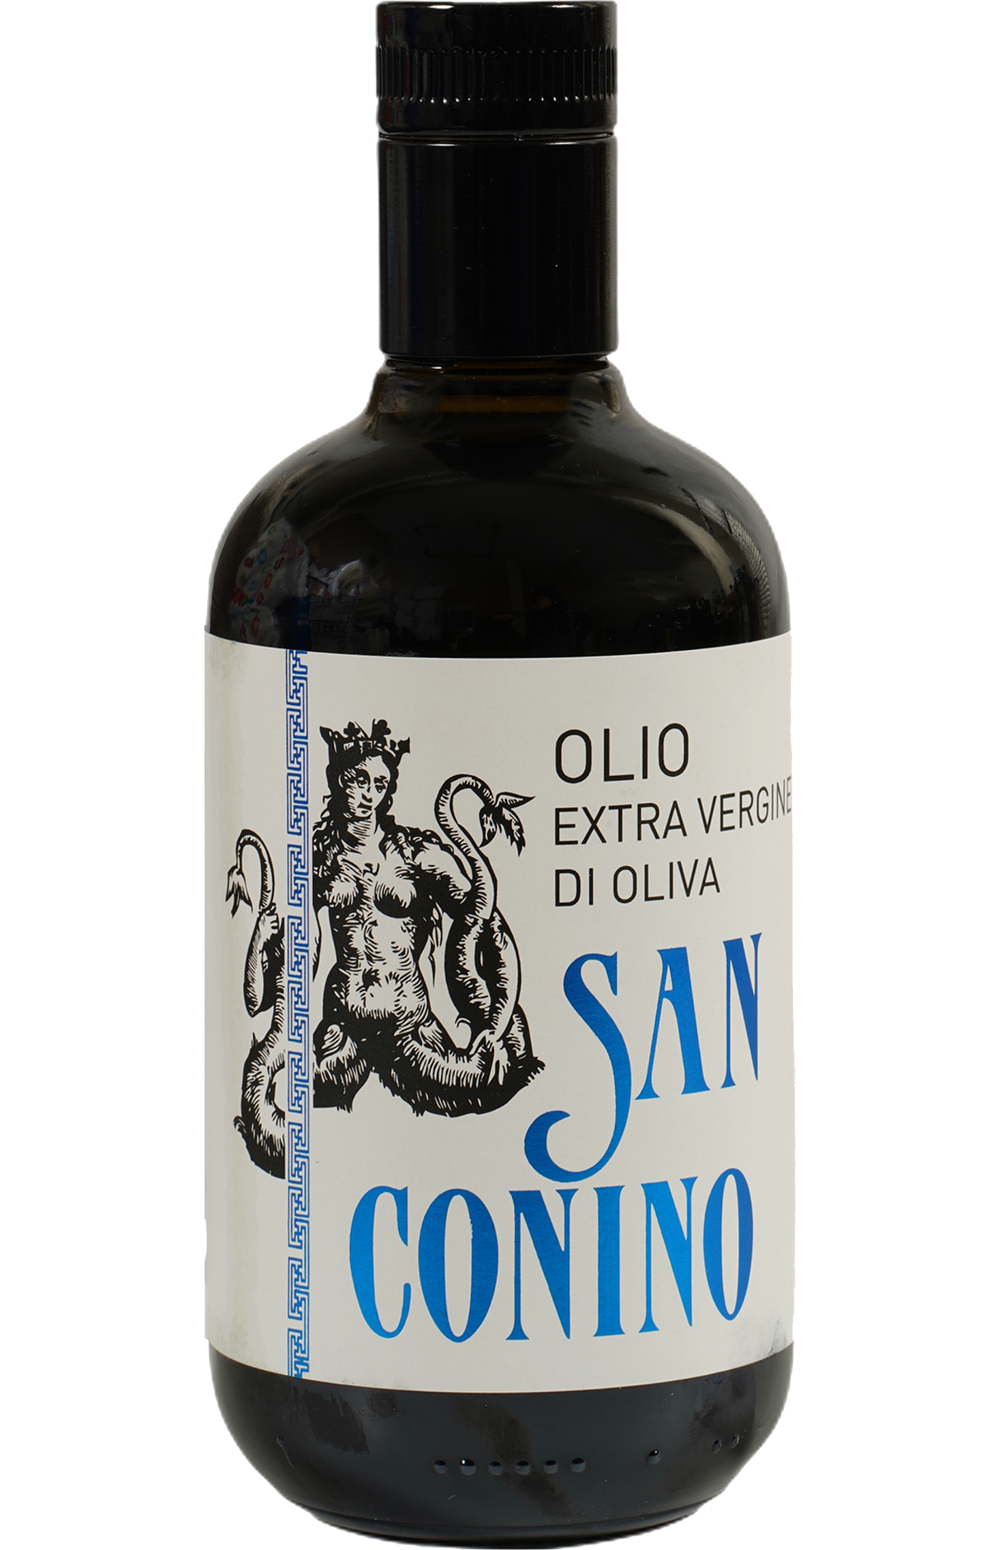 San Conino